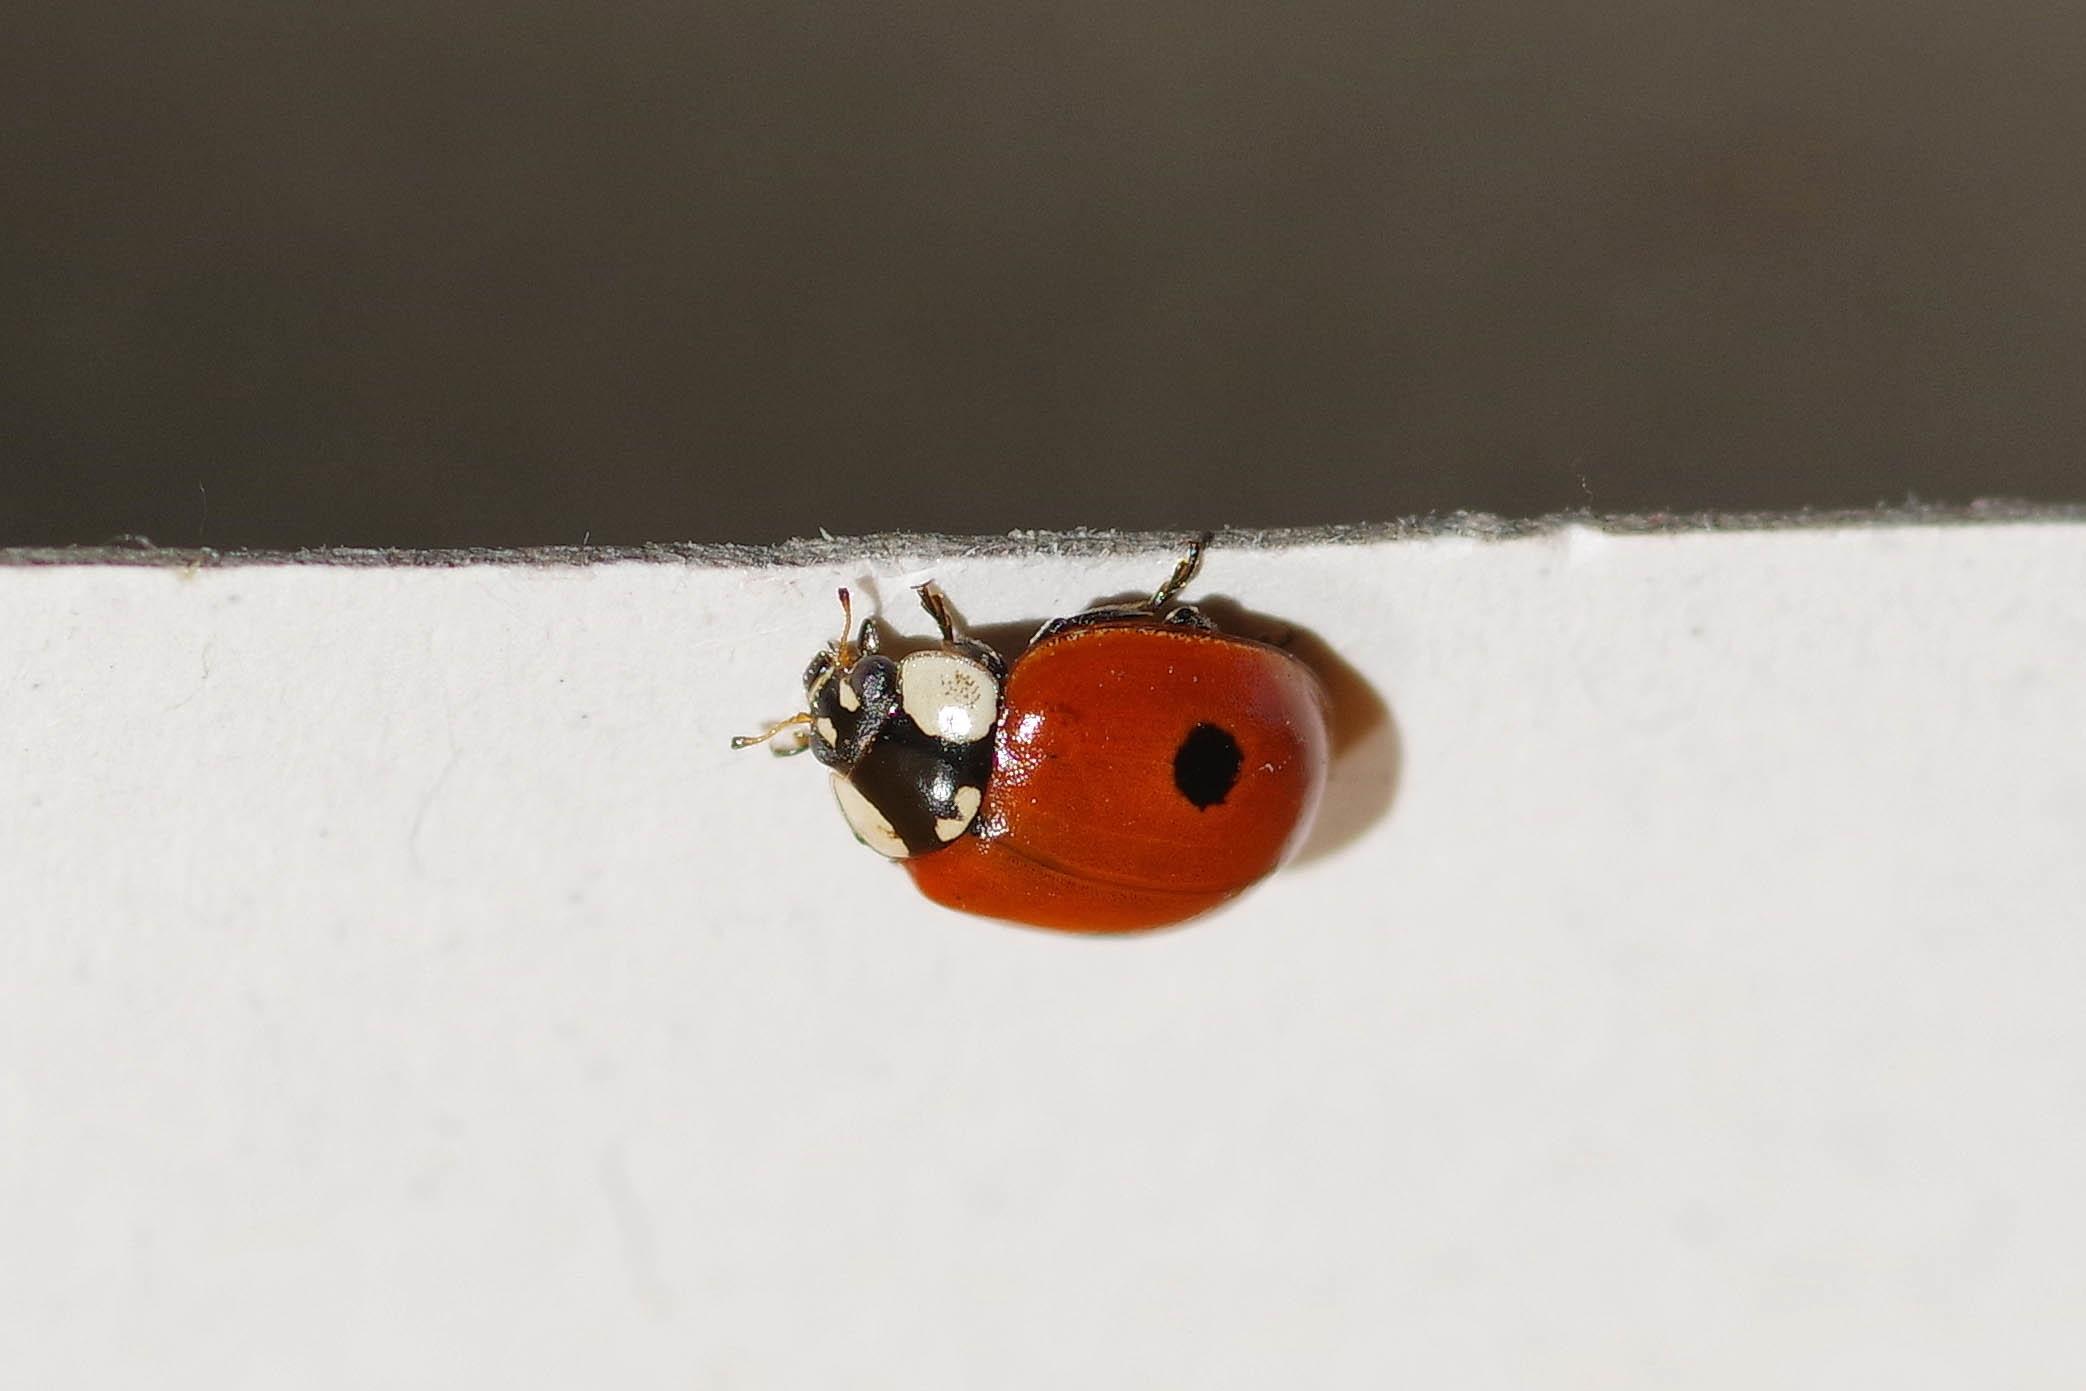 Foto/billede af Toplettet Mariehøne (Adalia bipunctata)